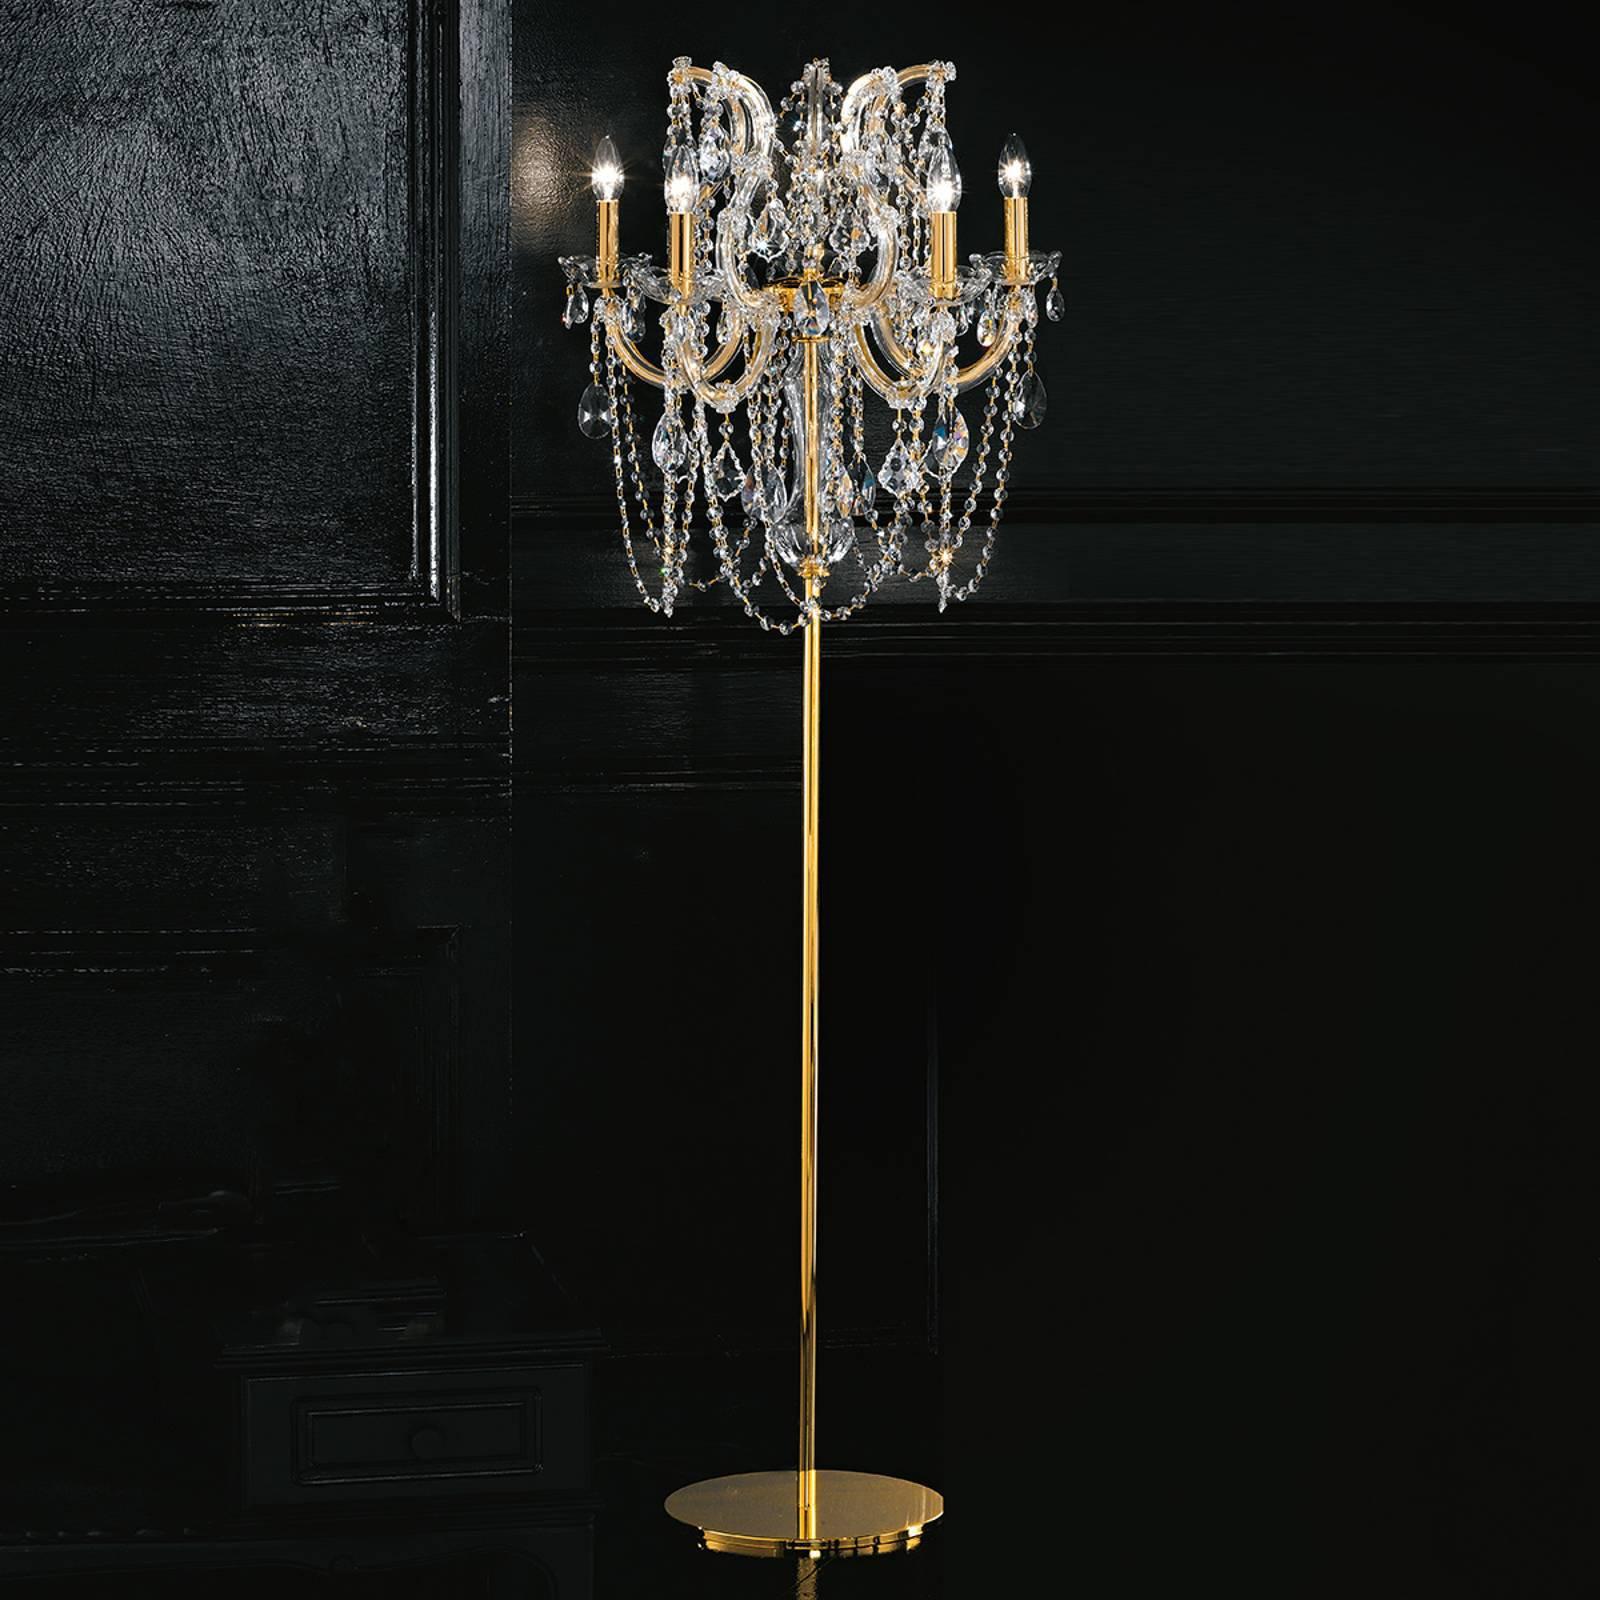 Opphøyet stålampe Annino med Swarovski Elements